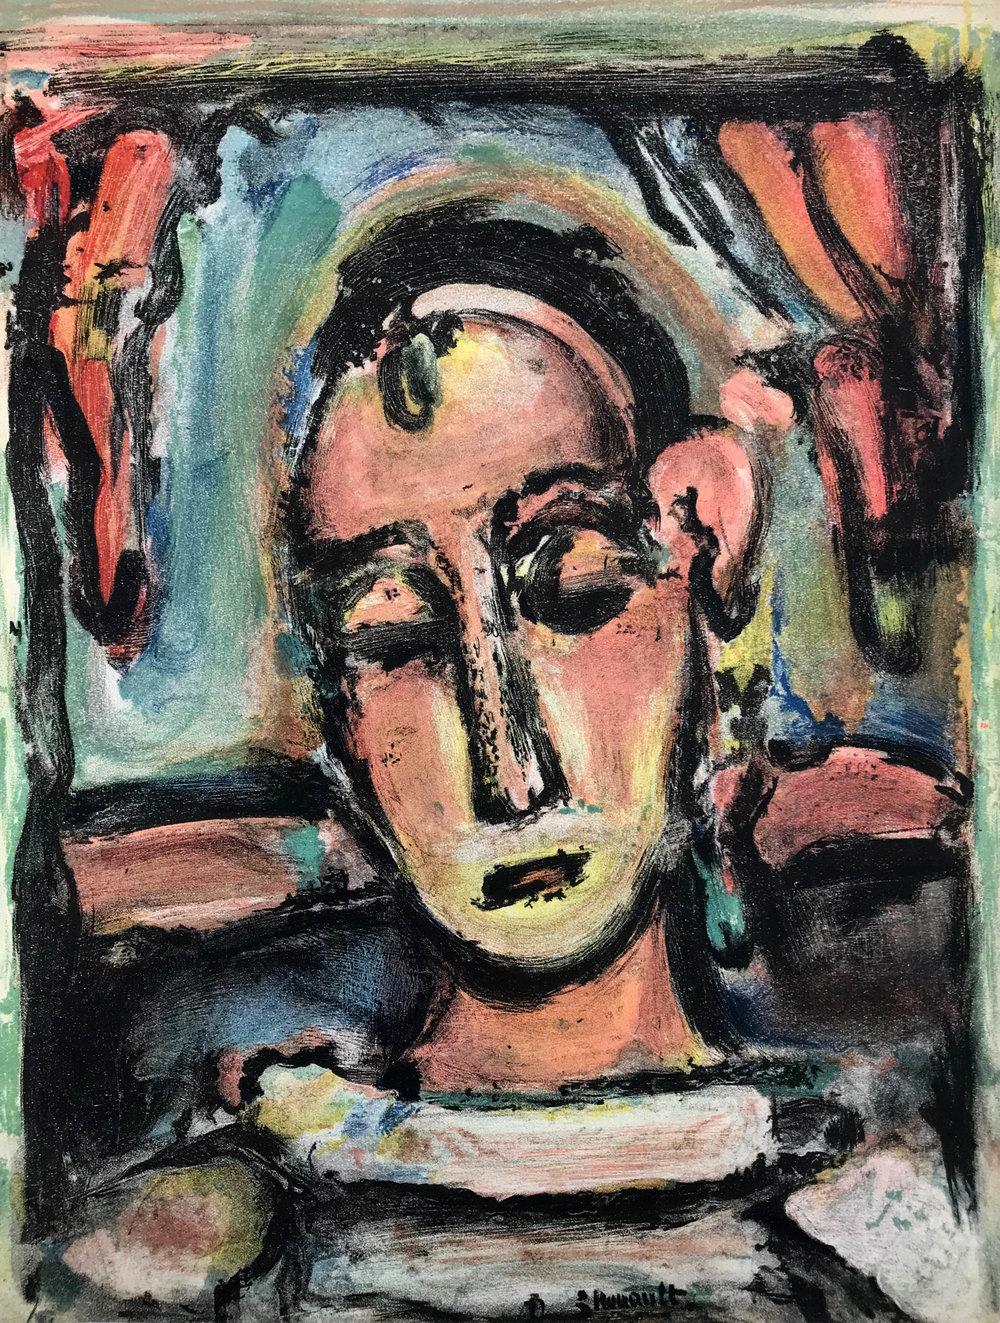 Tête de Jeune Fille , 1939 Lithograph Signed in plate 35.2 x 26cm (image)